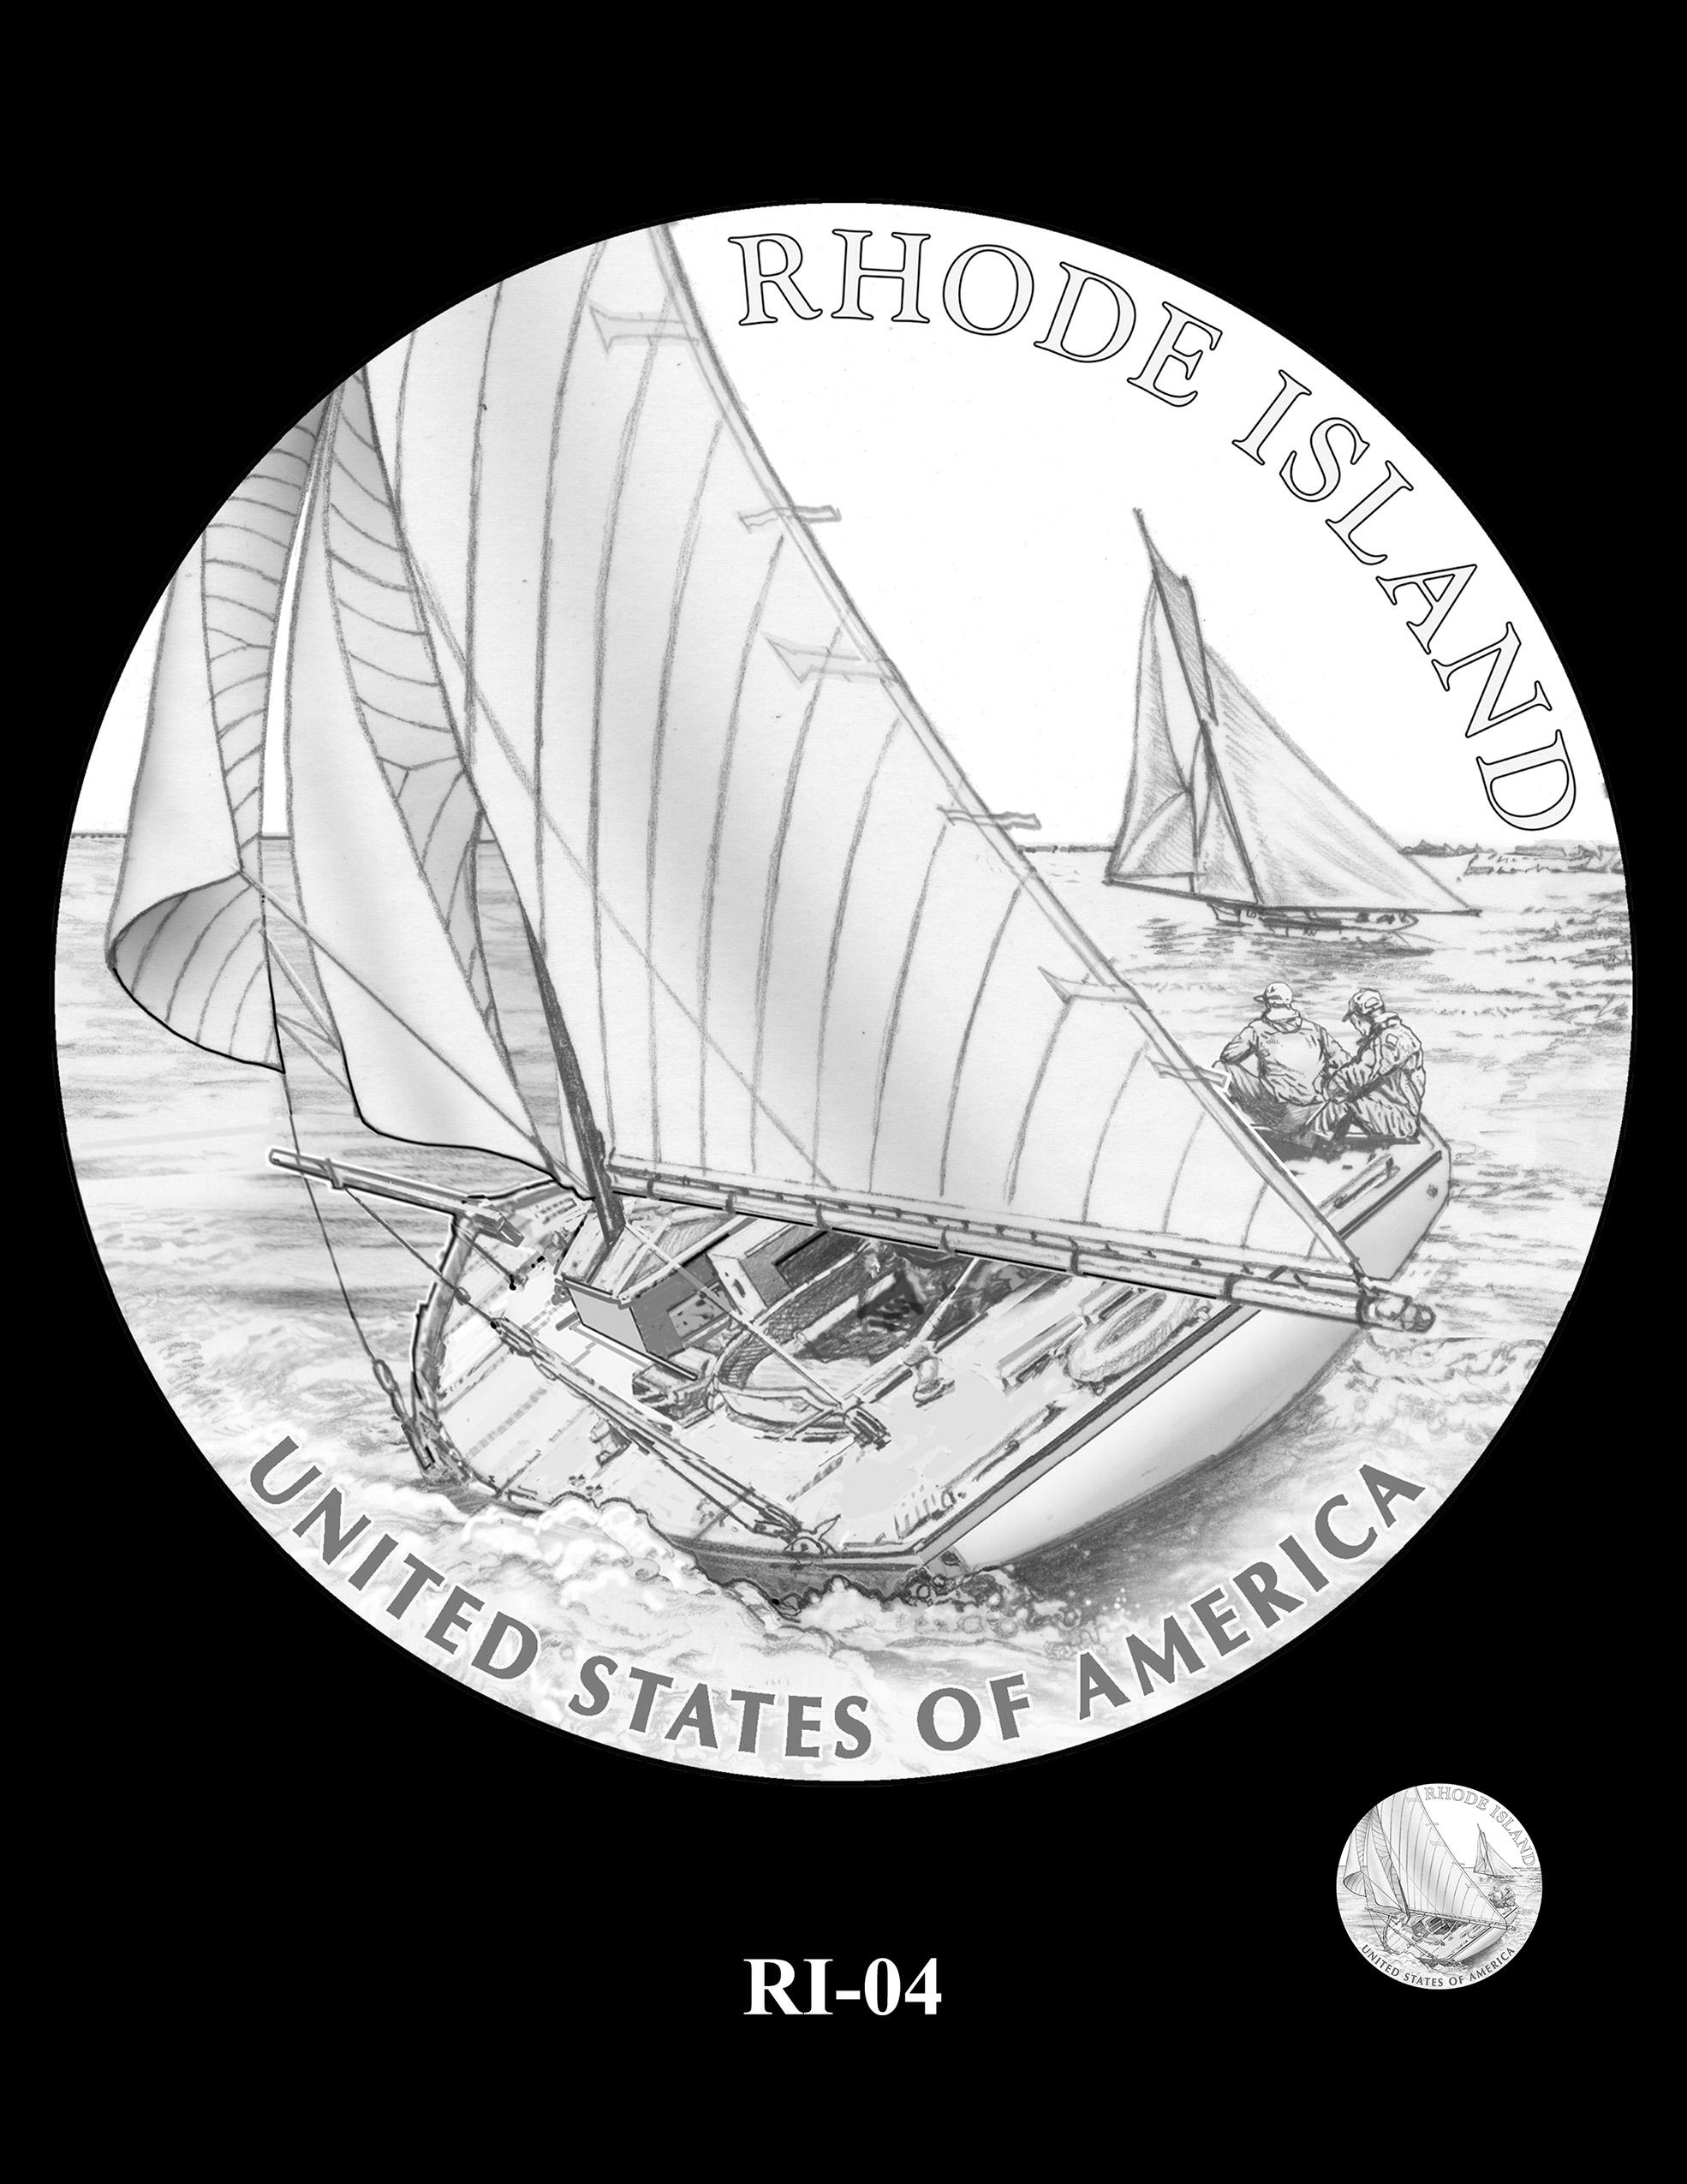 RI-04 -- 2022 American Innovation $1 Coin - Rhode Island